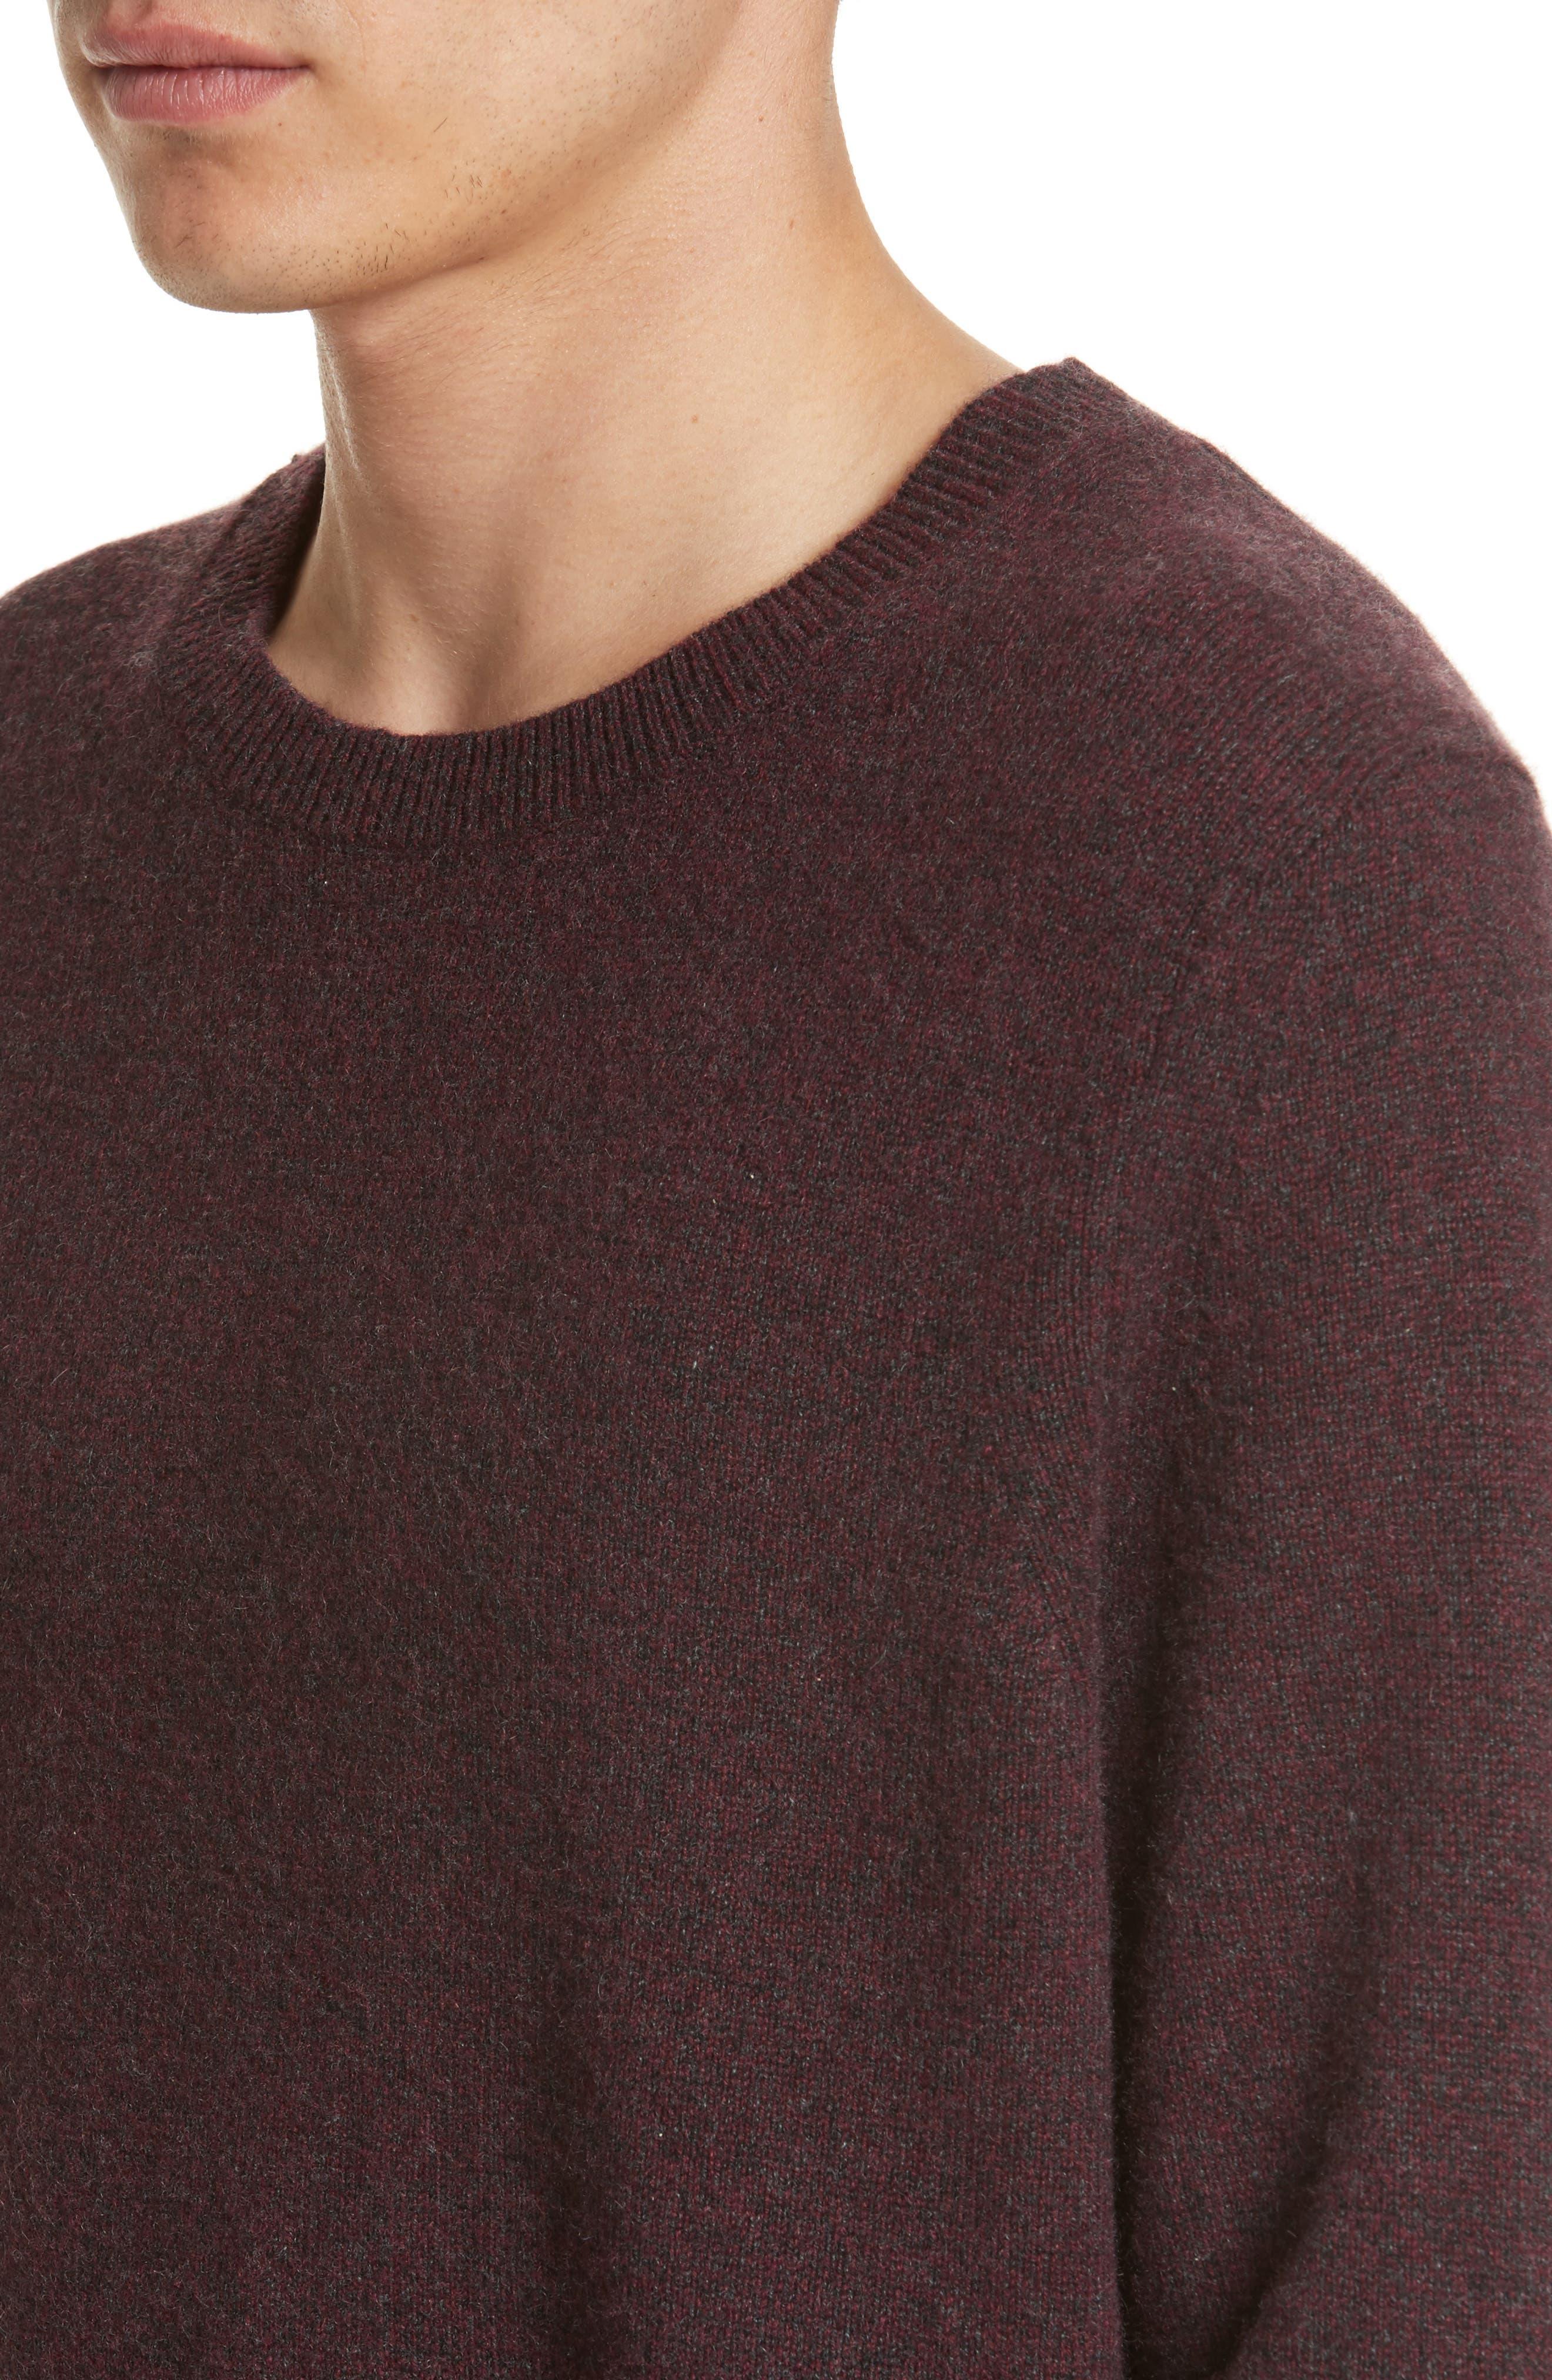 Holdon Cashmere Sweater,                             Alternate thumbnail 4, color,                             Burgundy